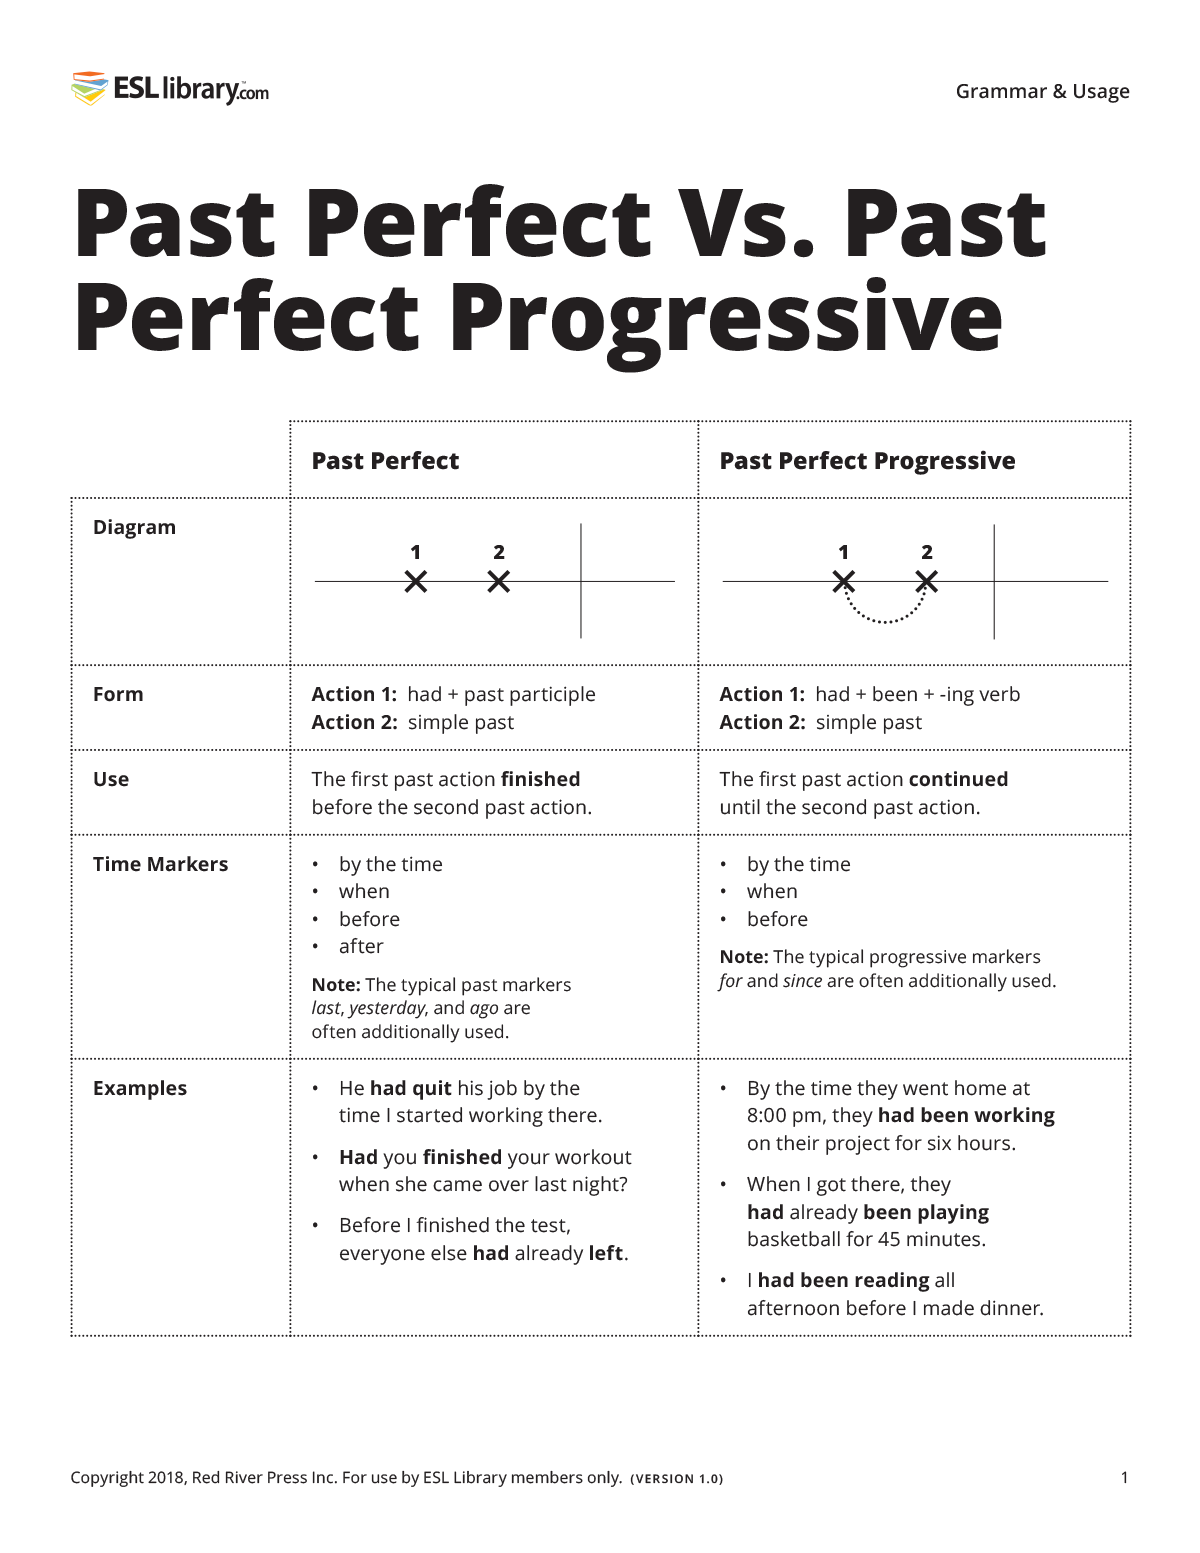 Past Perfect Vs. Past Perfect Progressive Grammar & Usage Resource